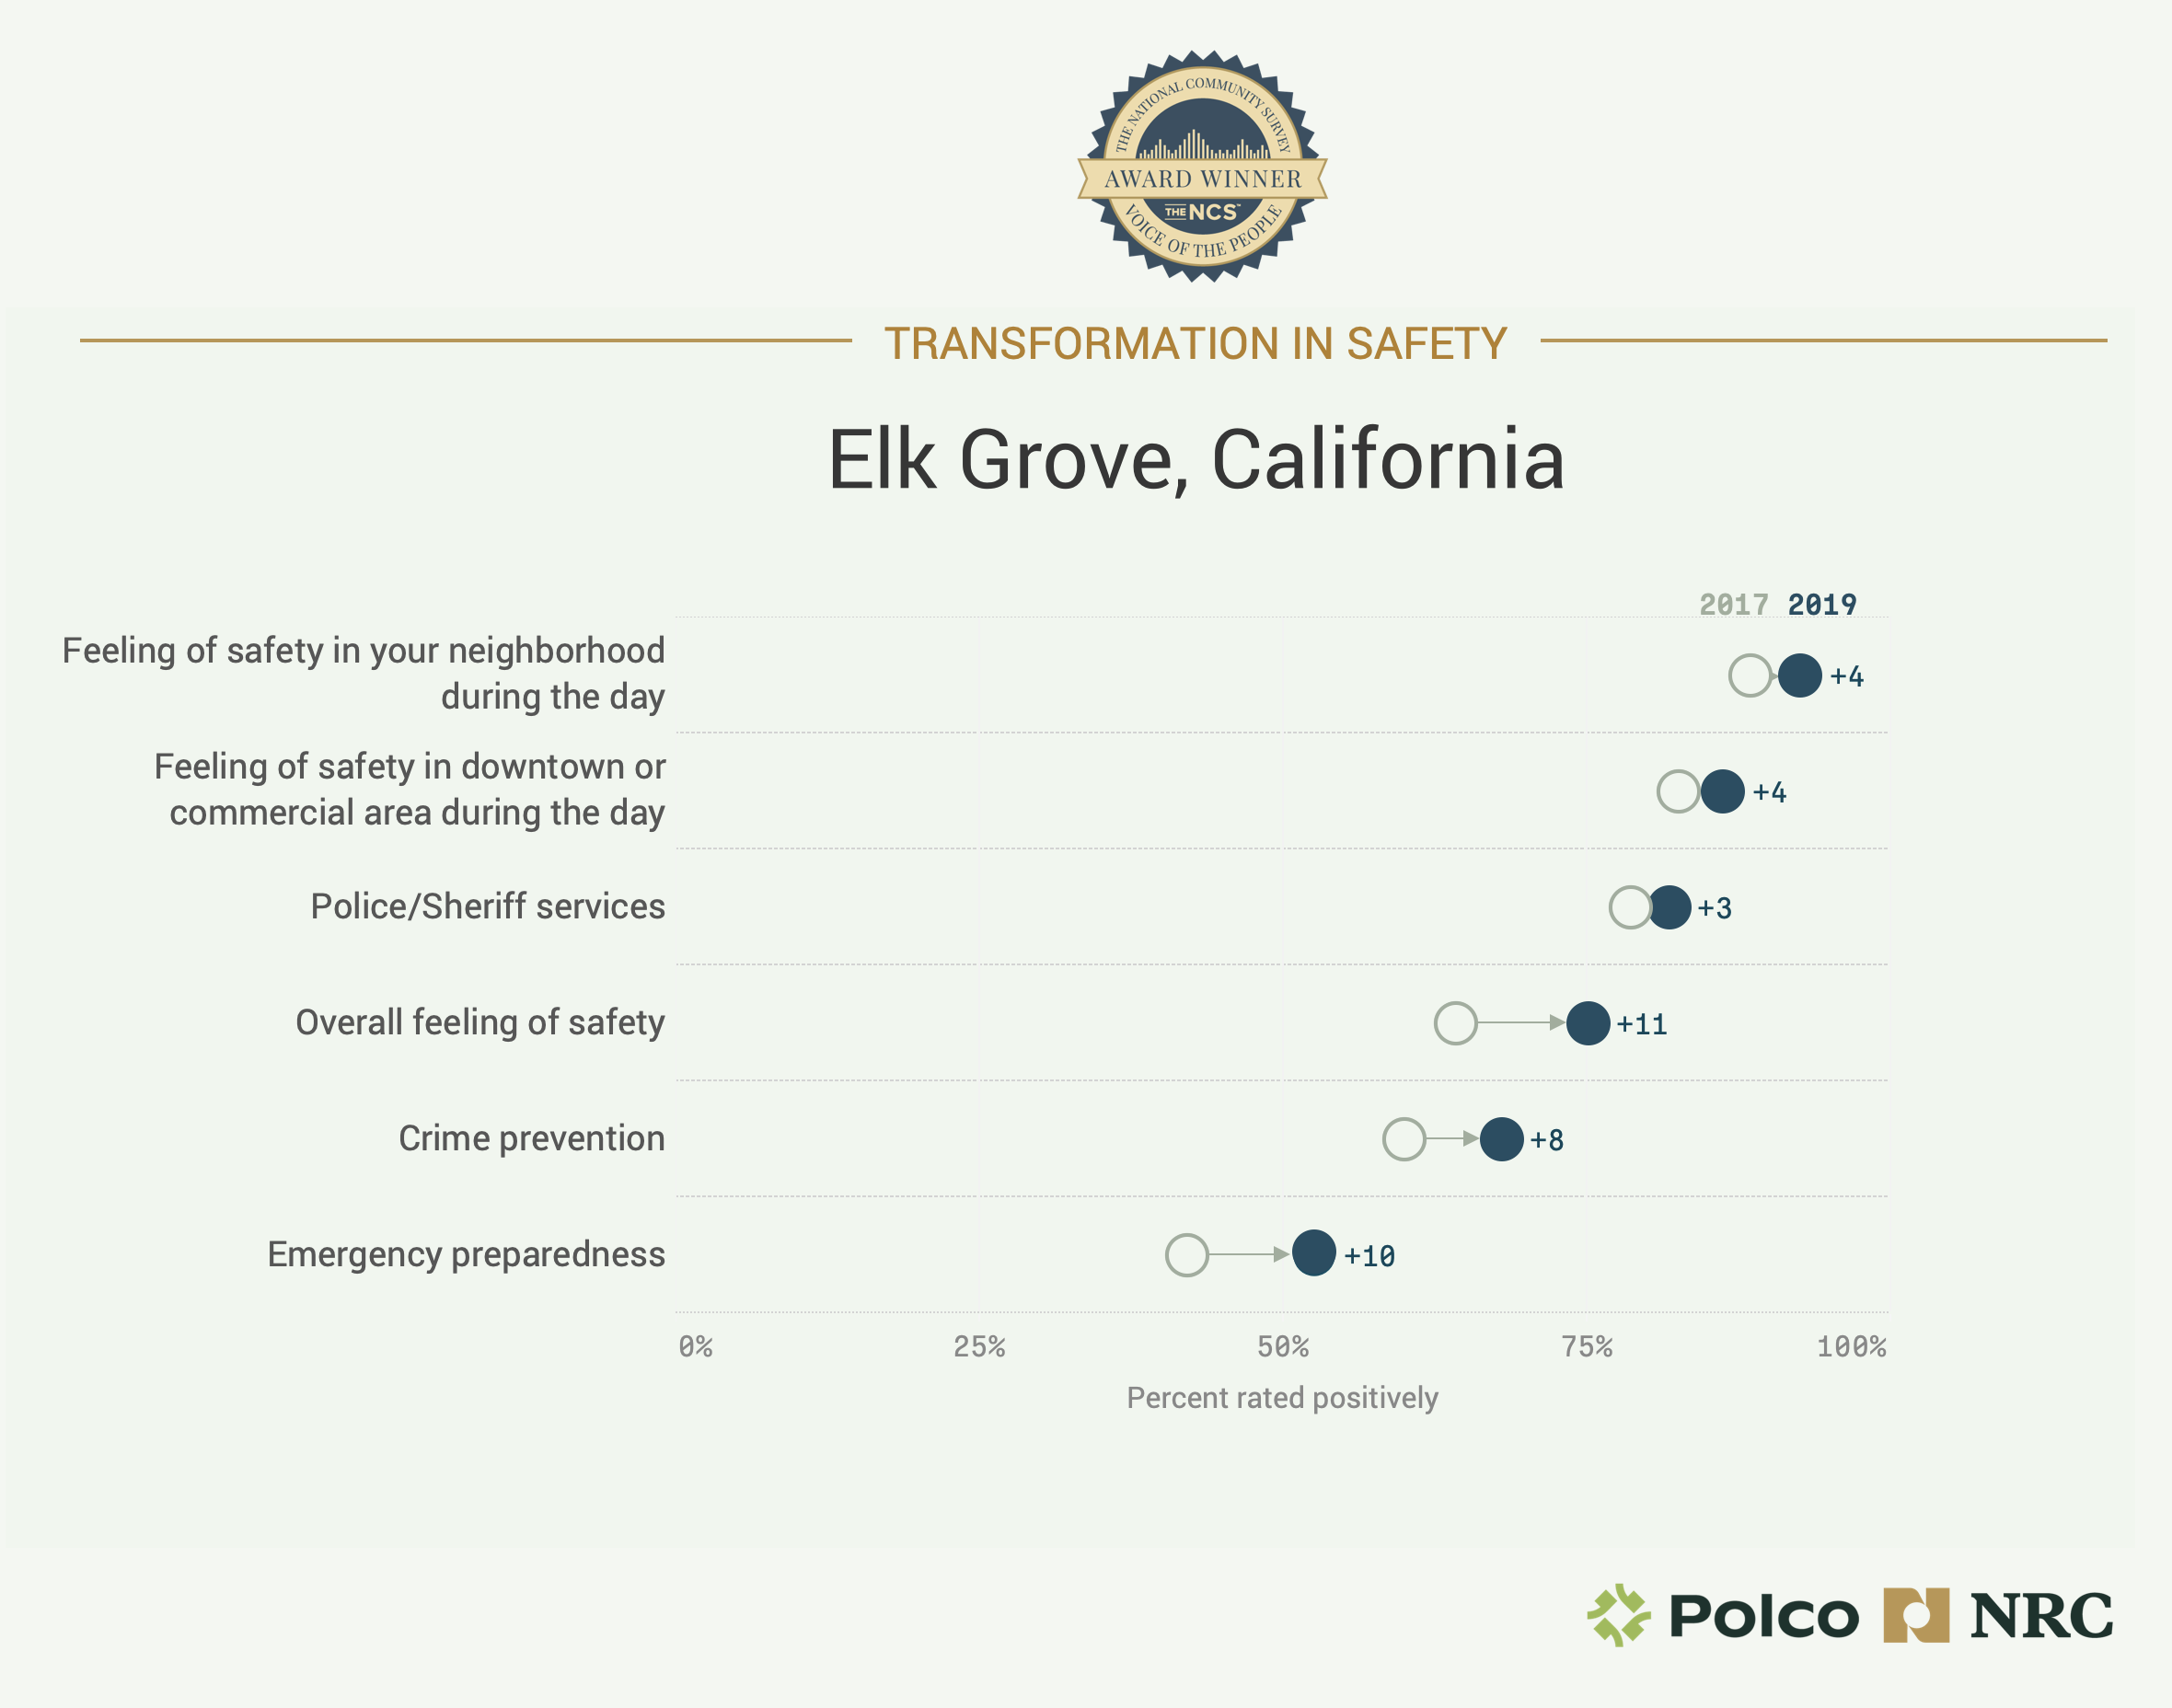 Elk Grove's Transformation in Safety